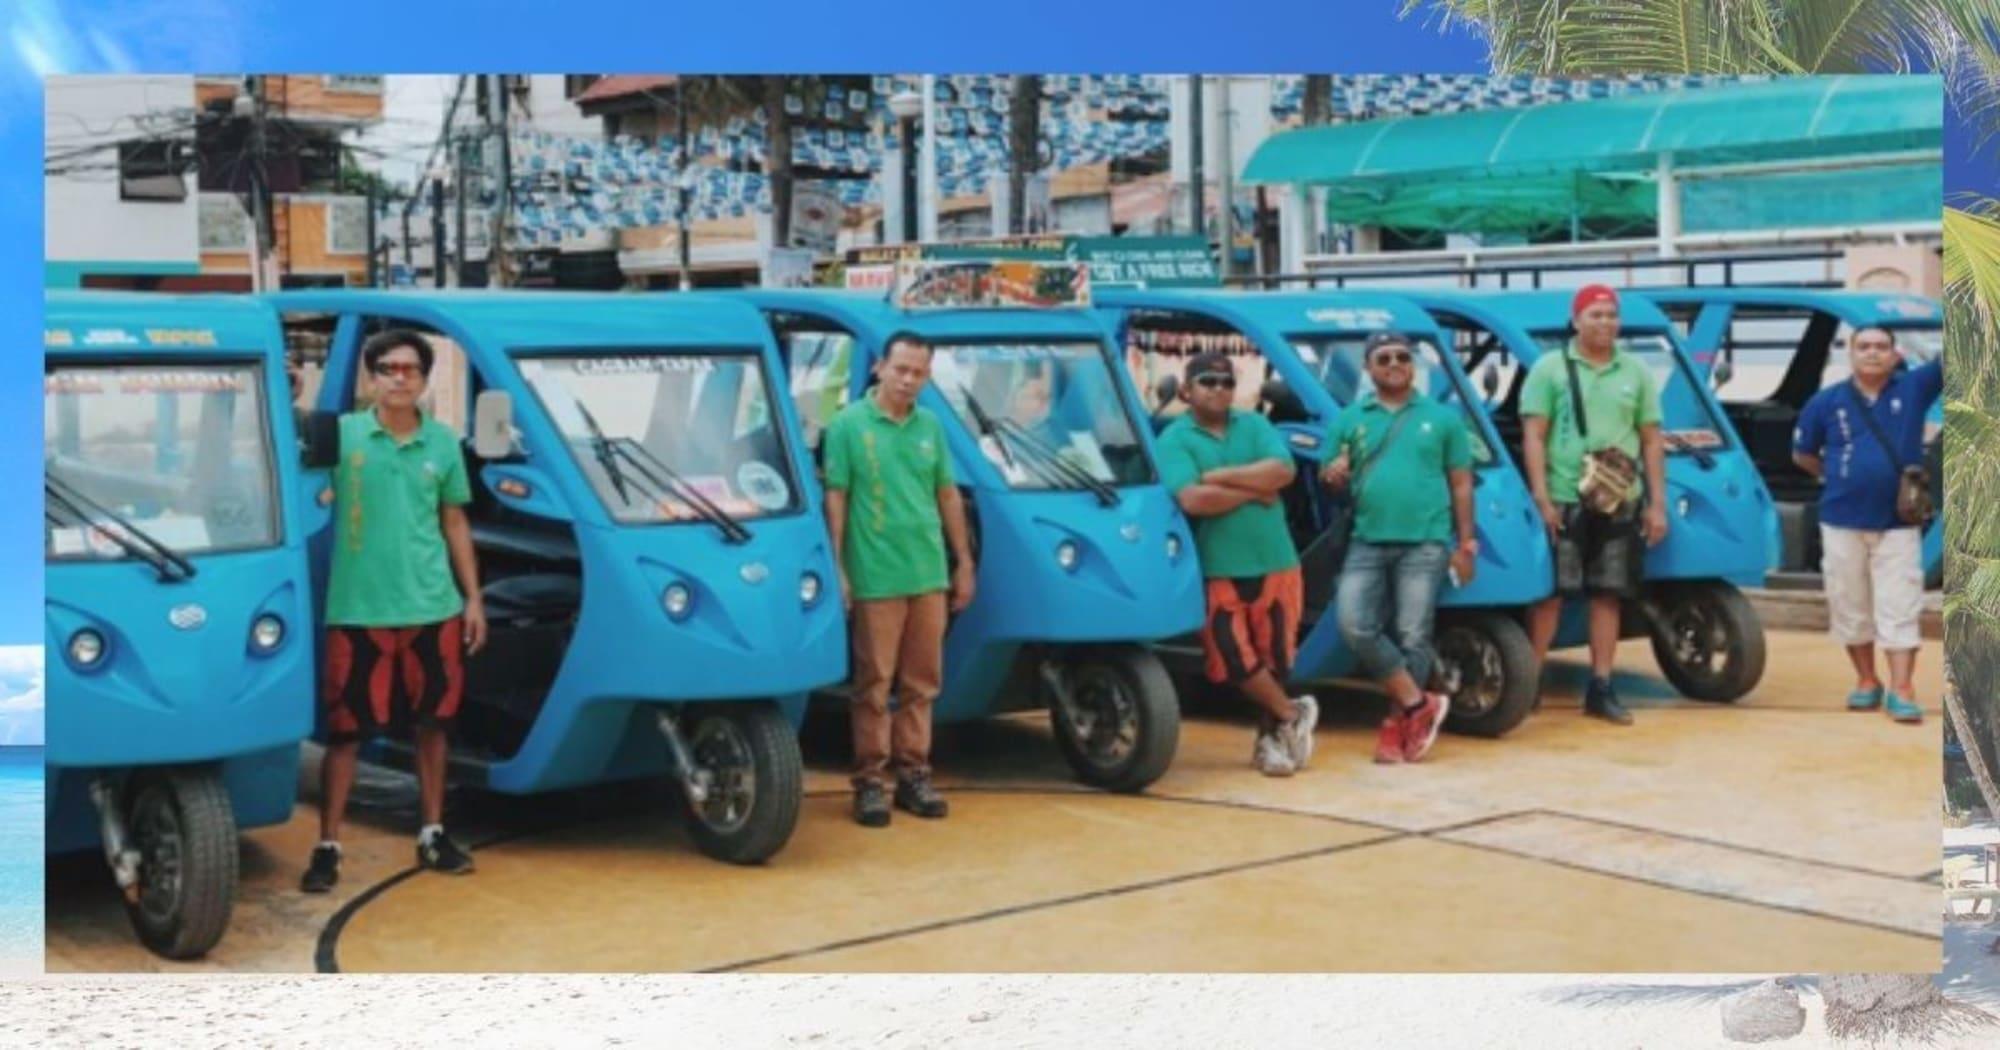 Boracay e-trike supplier urged to get proper accreditation